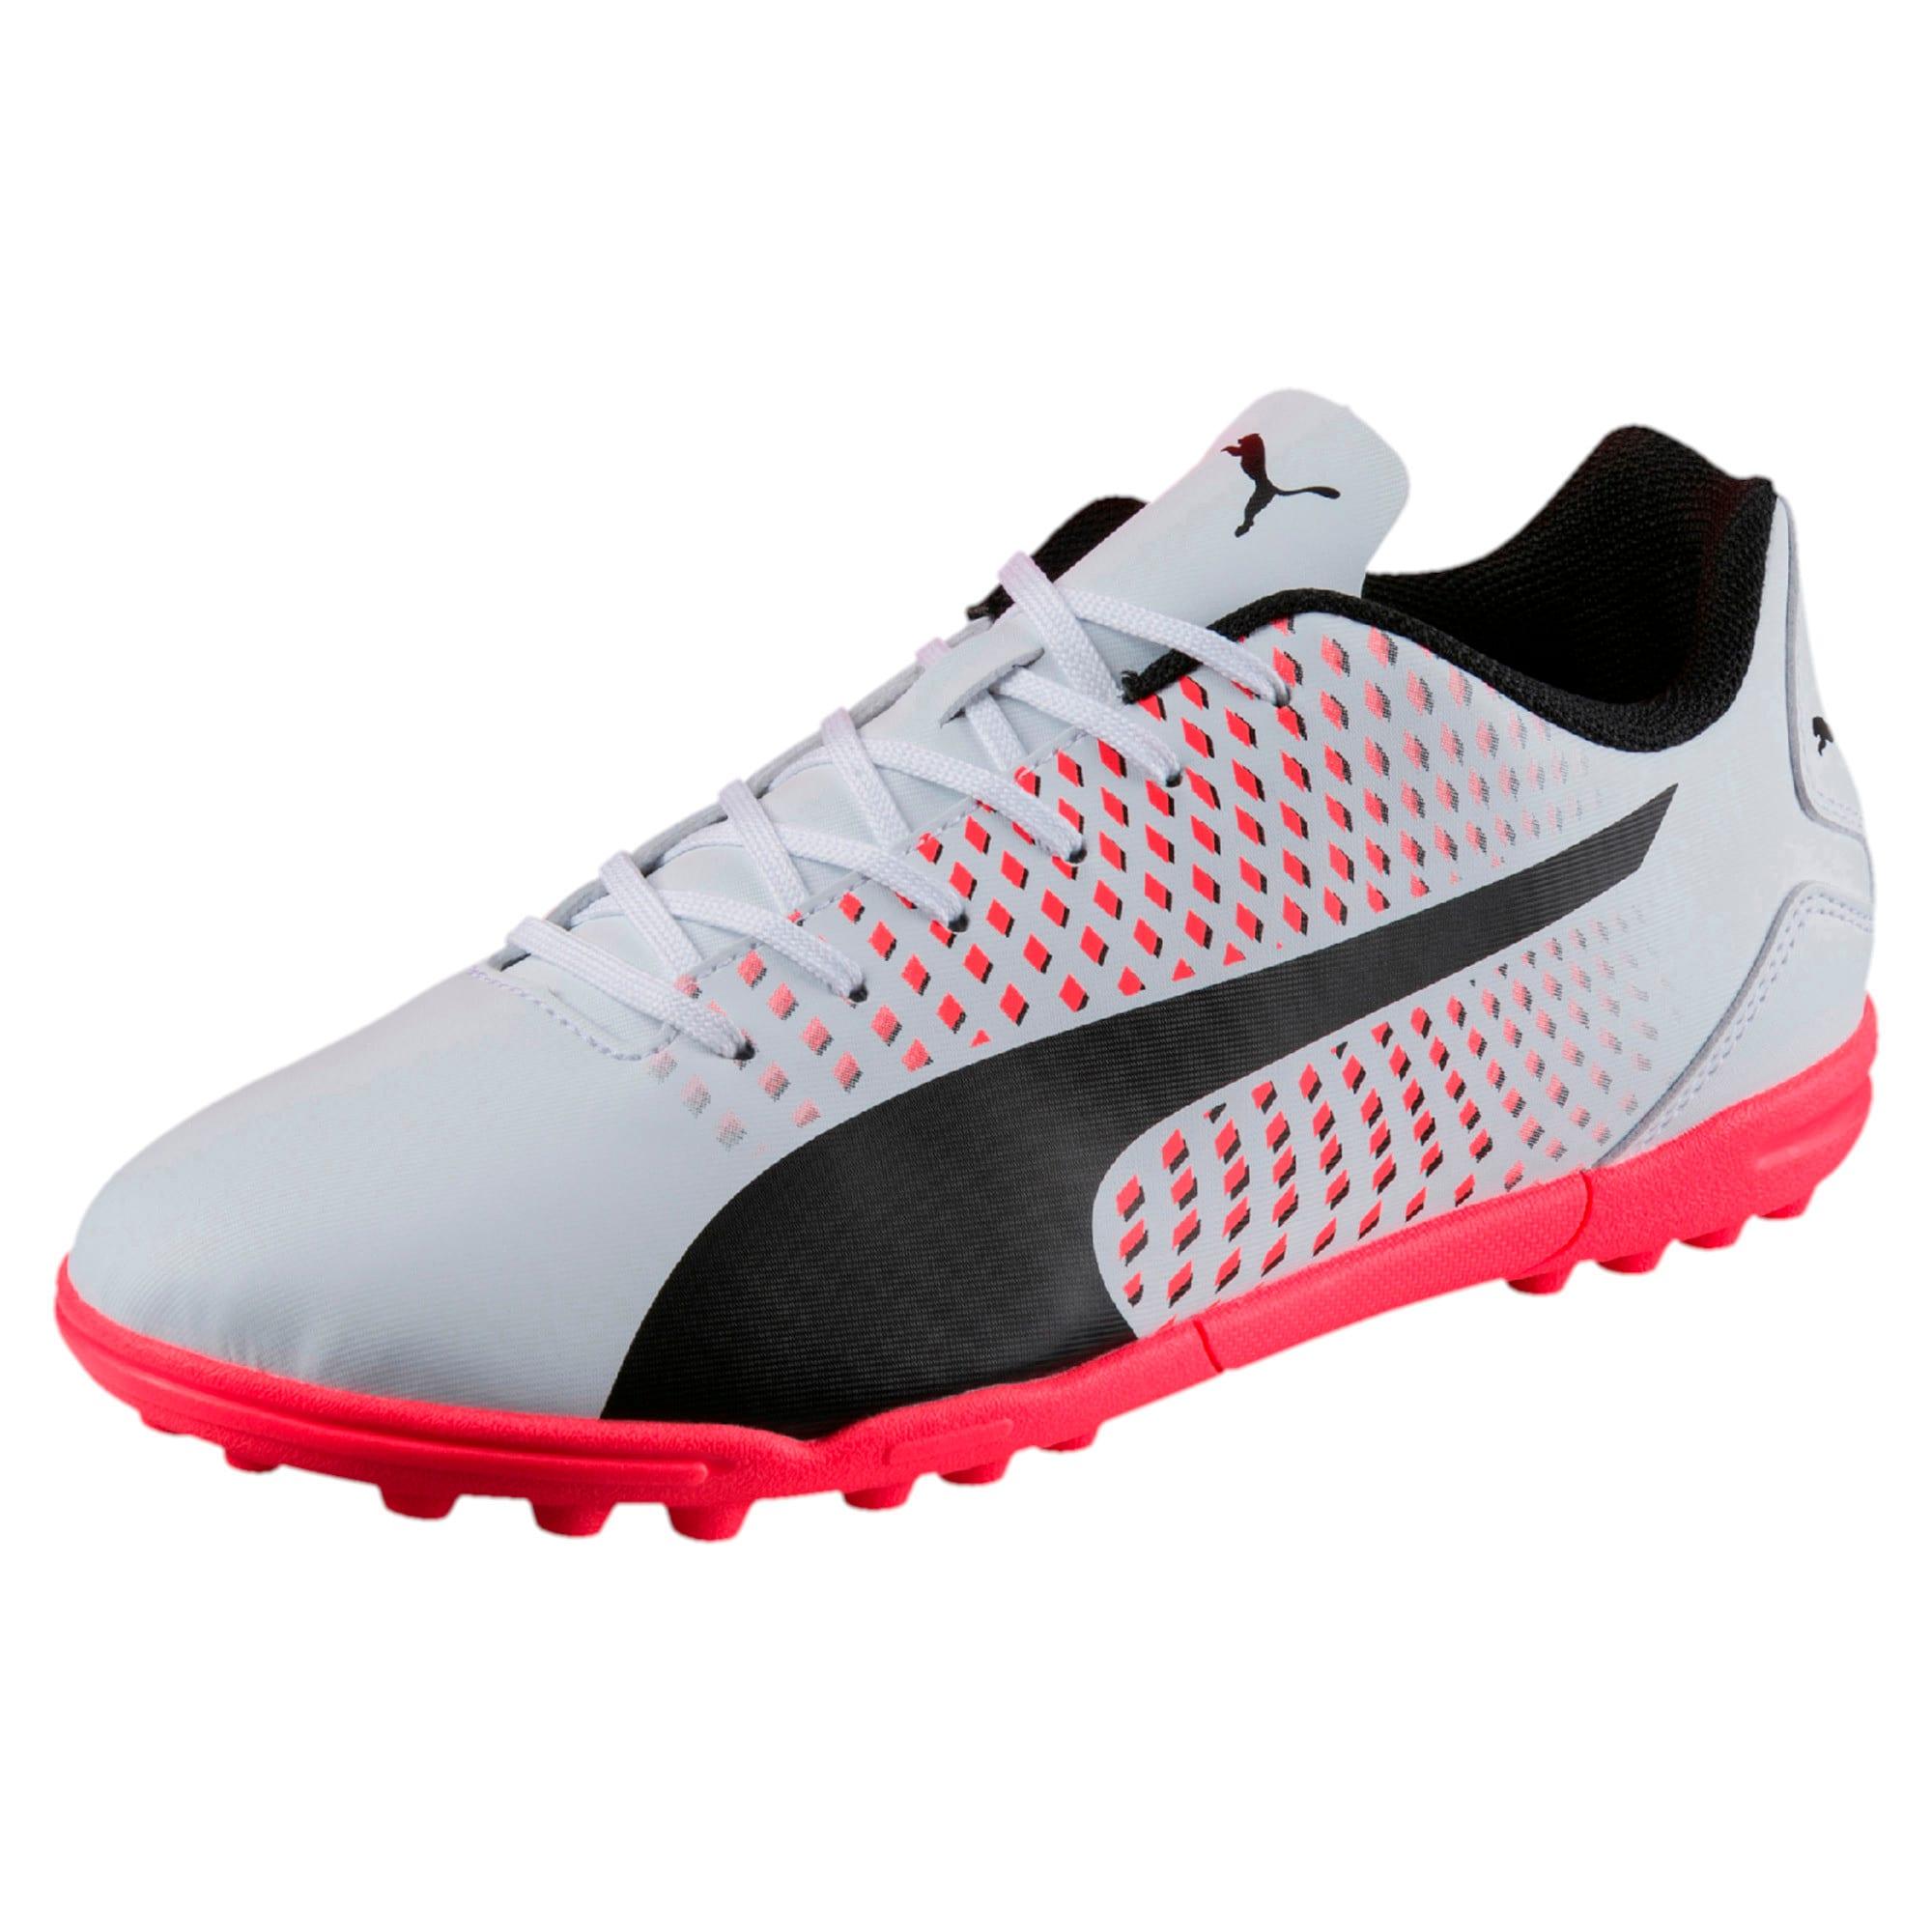 Thumbnail 1 of Adreno III TT Men's Football Boots, White-Black-Coral, medium-IND